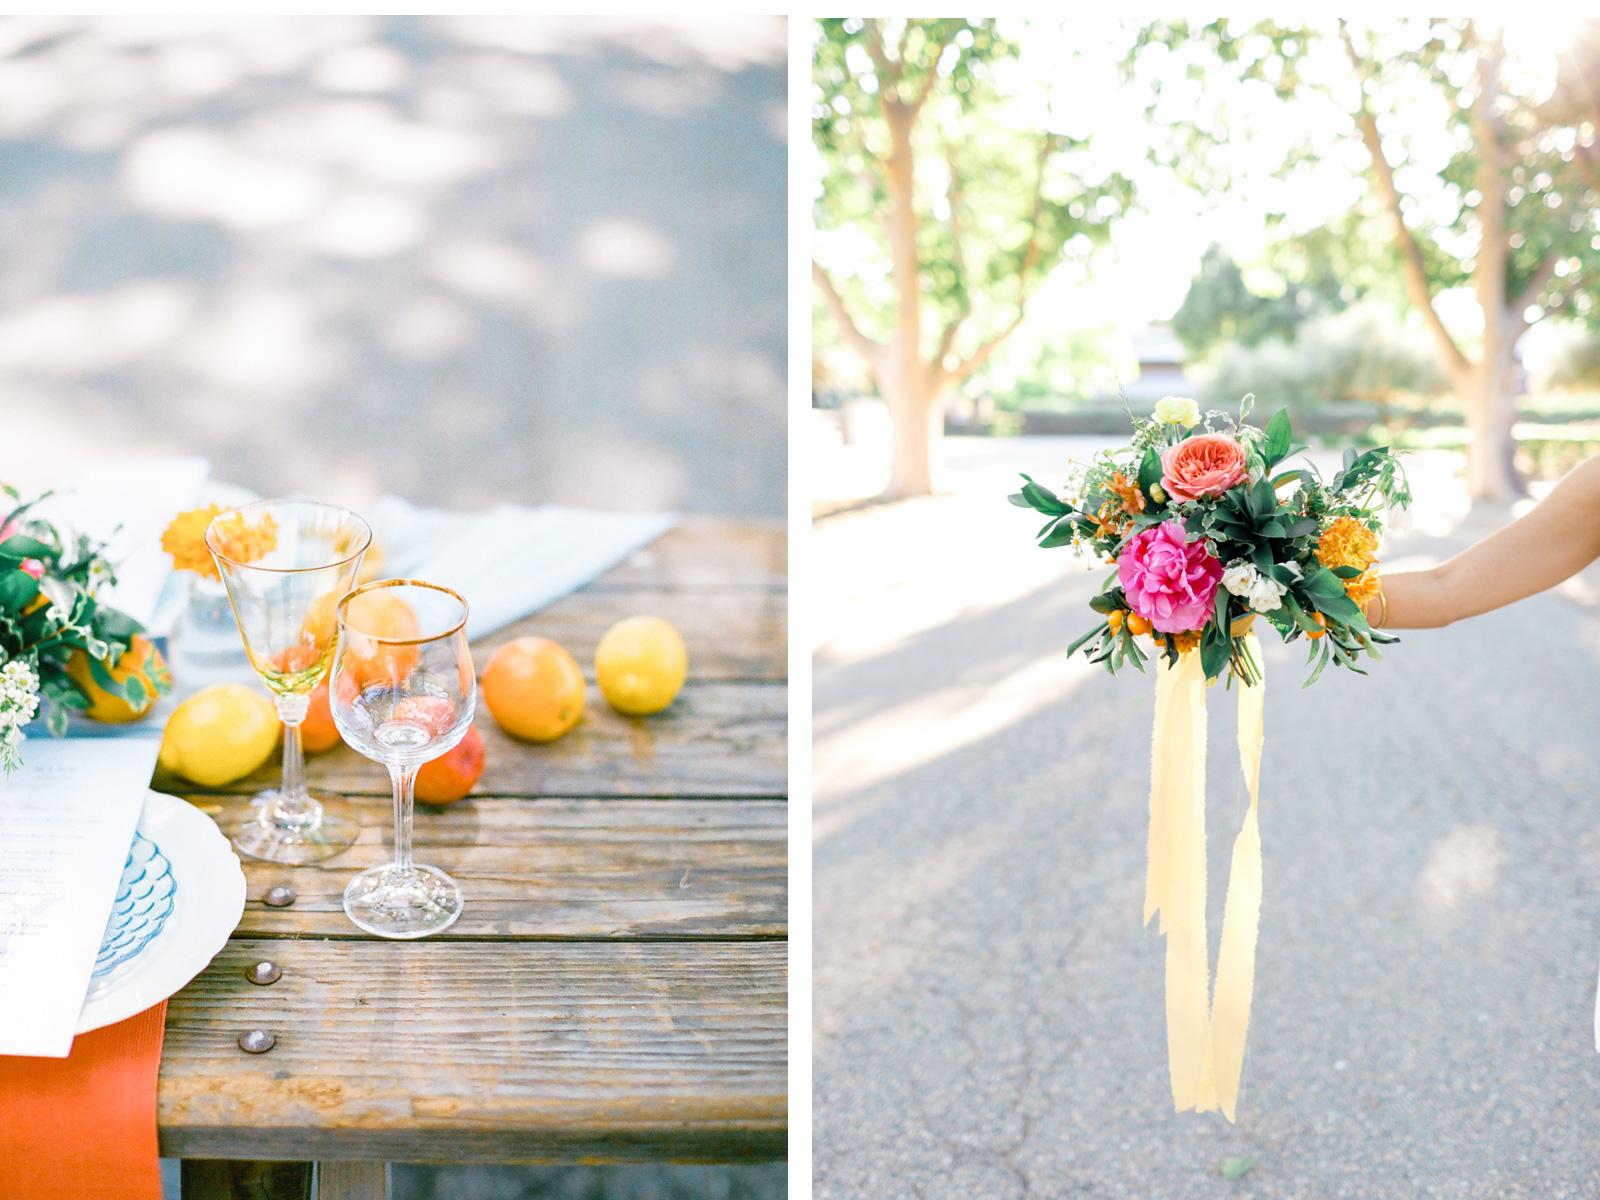 Whispering-Rose-Ranch-Wedding-Natalie-Schutt-Fine-Art-Photography-Style-Me-Pretty_06.jpg